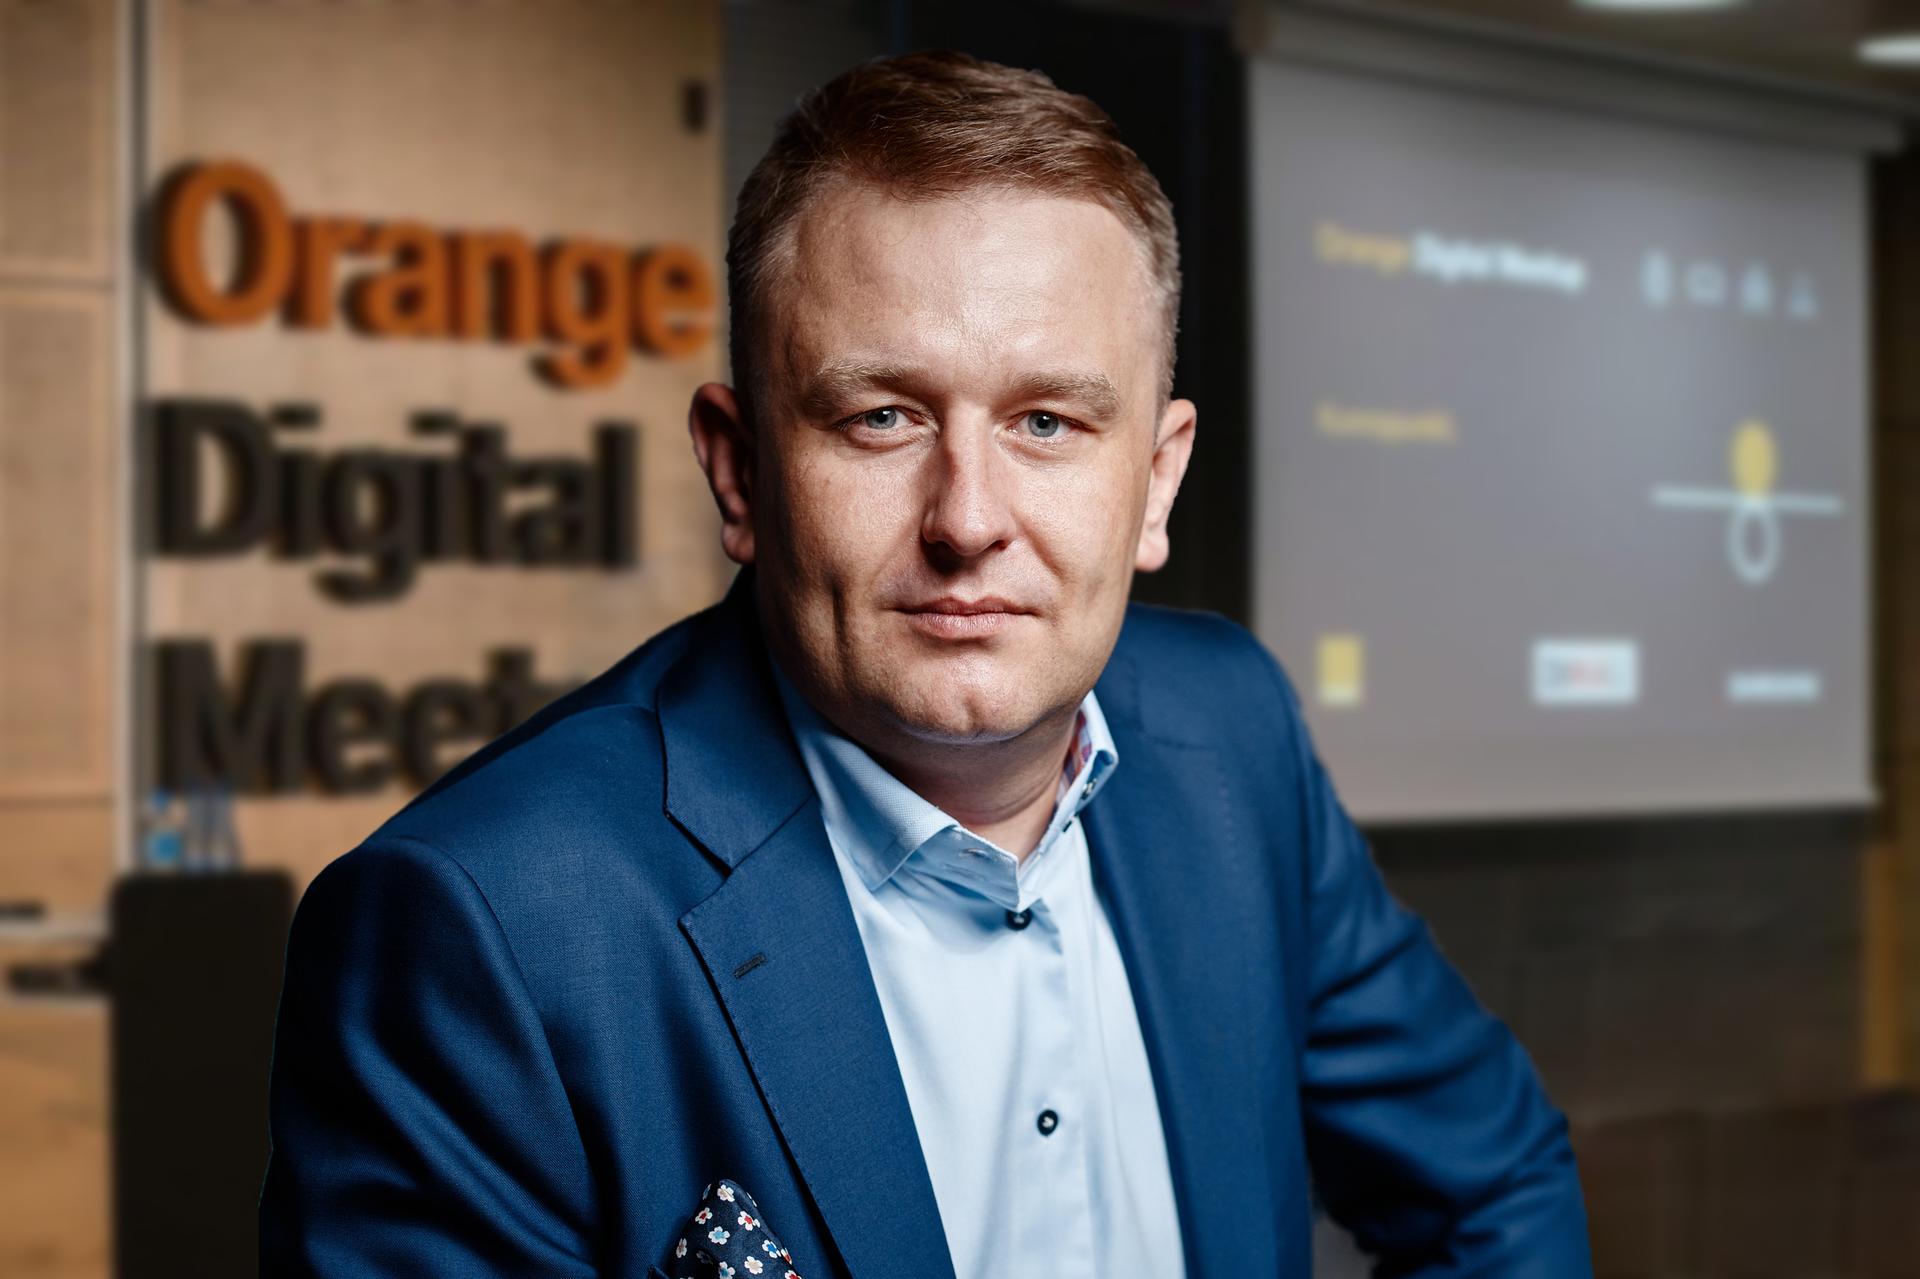 Senior Digital Transformation Executive Joins Synerise